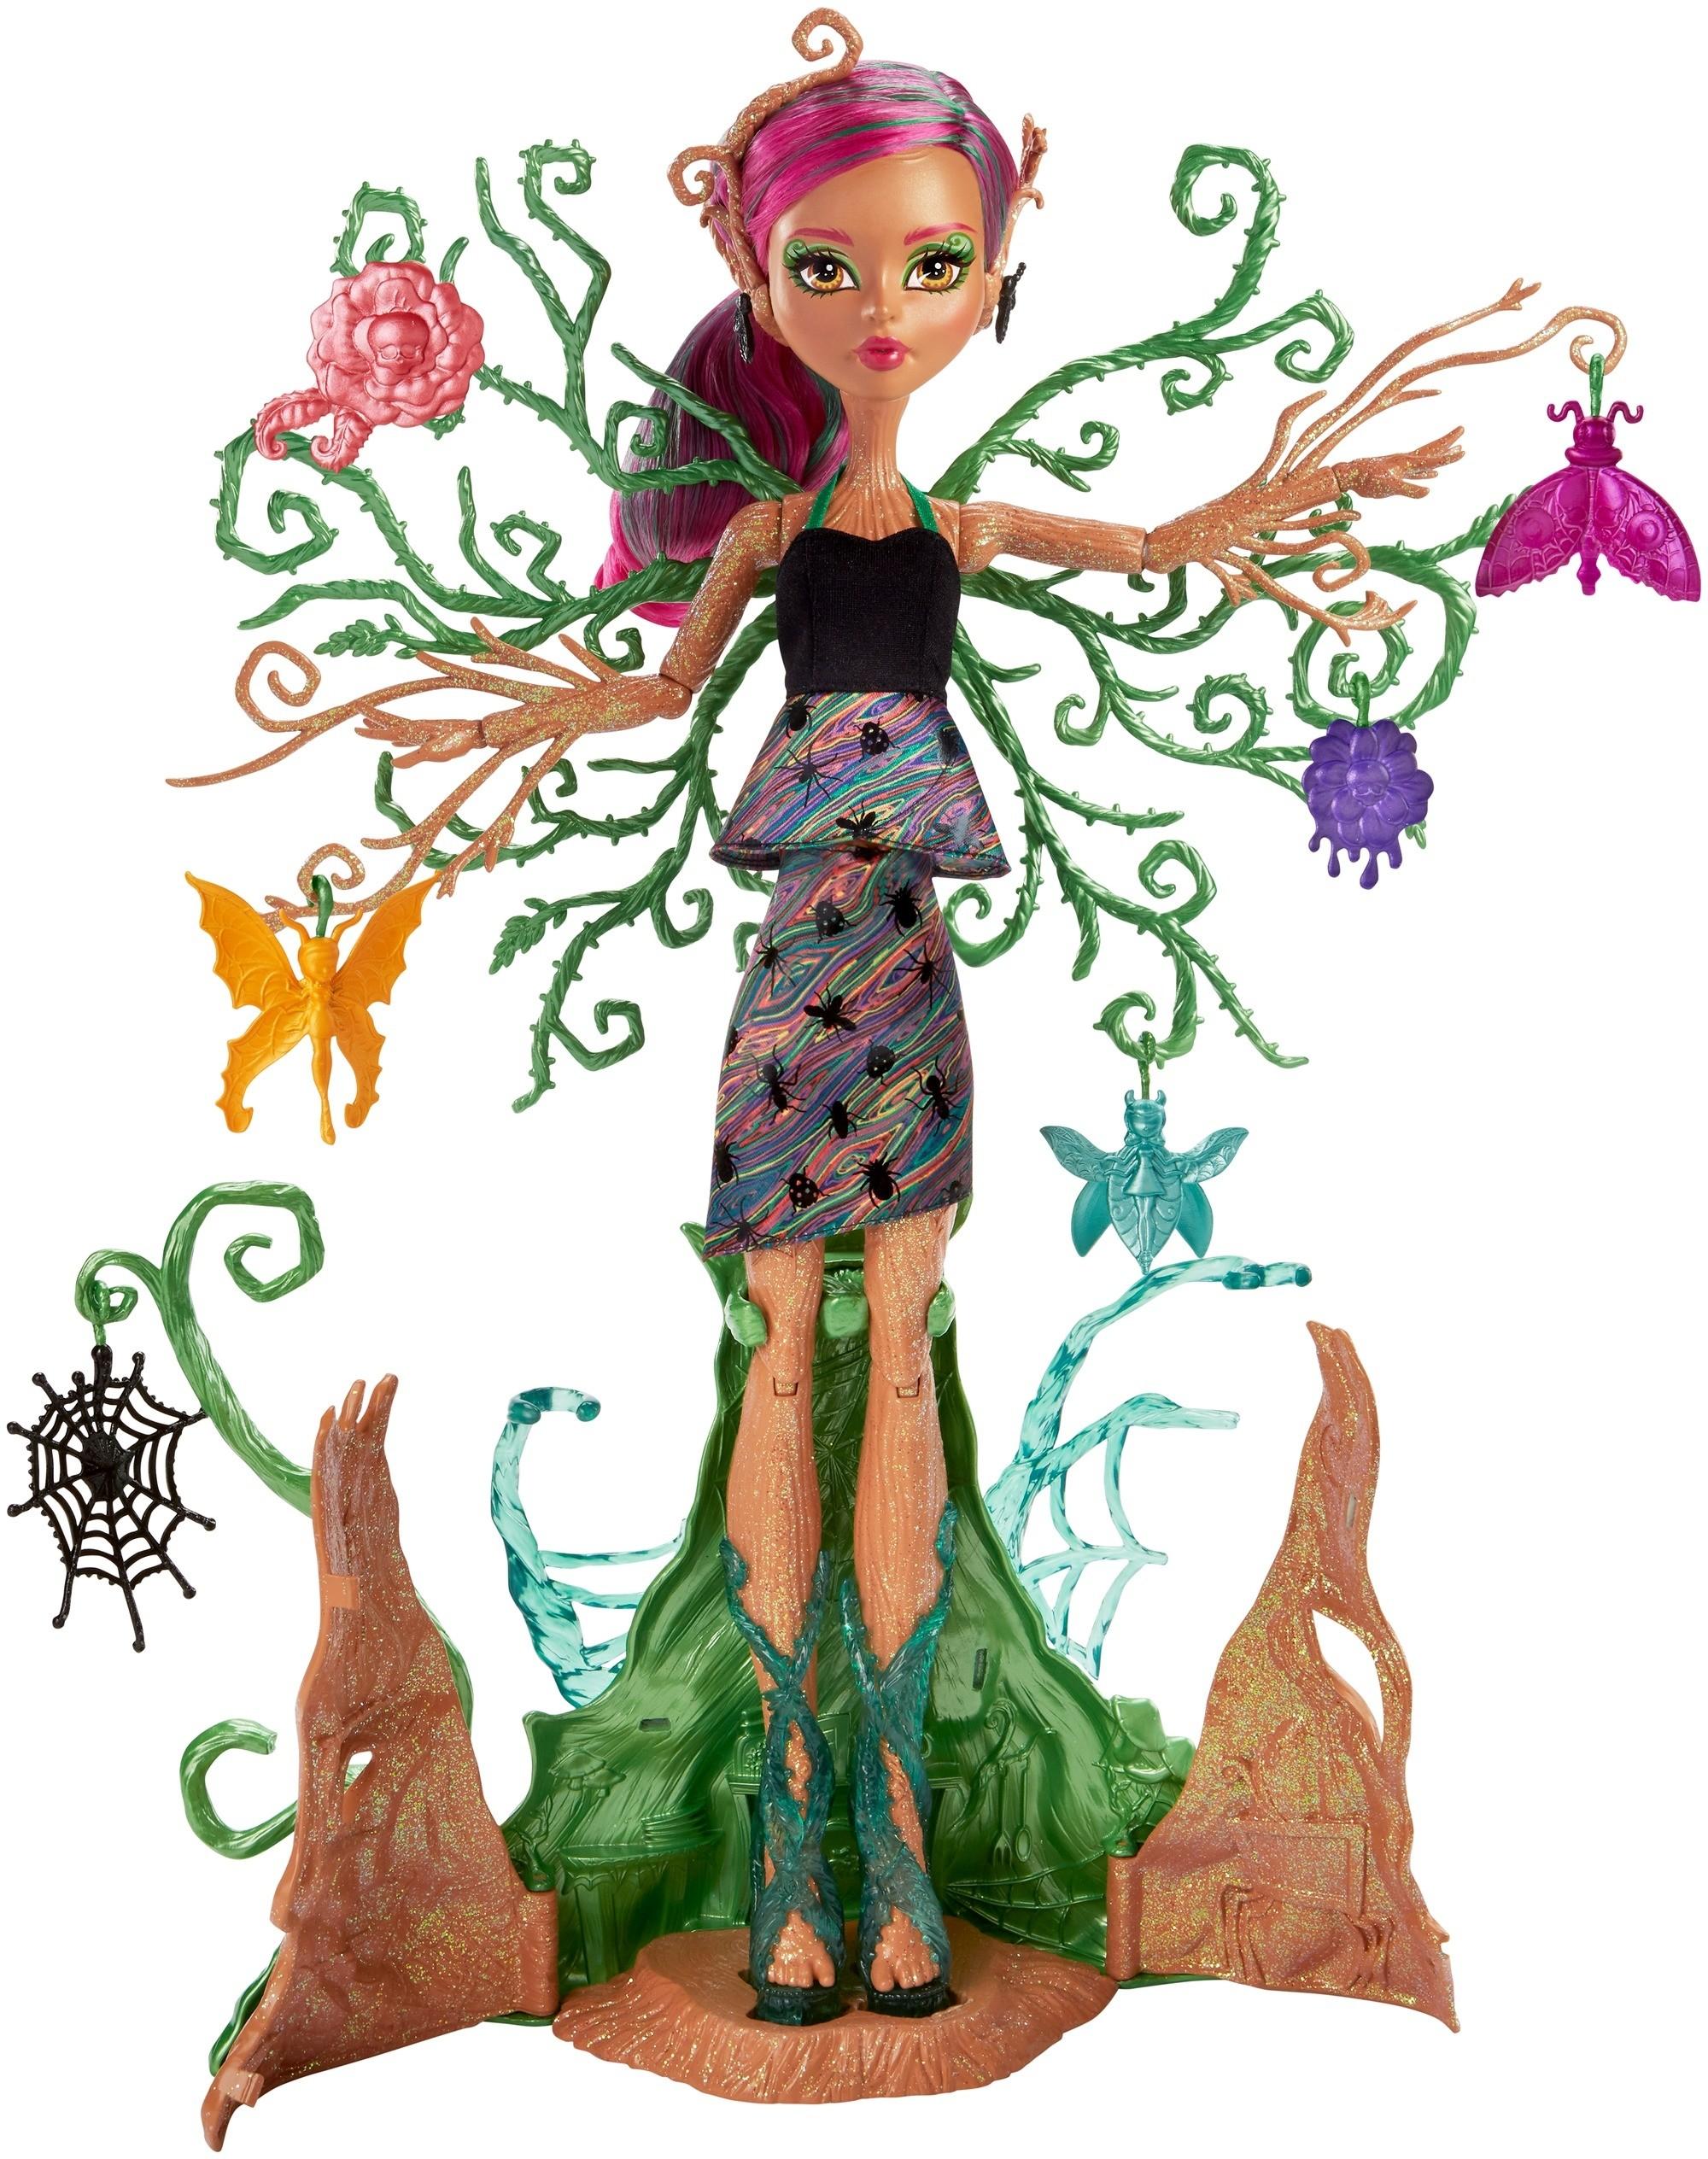 Monster High Monster High Кукла Monster High «Цветочные монстряшки: Триса»